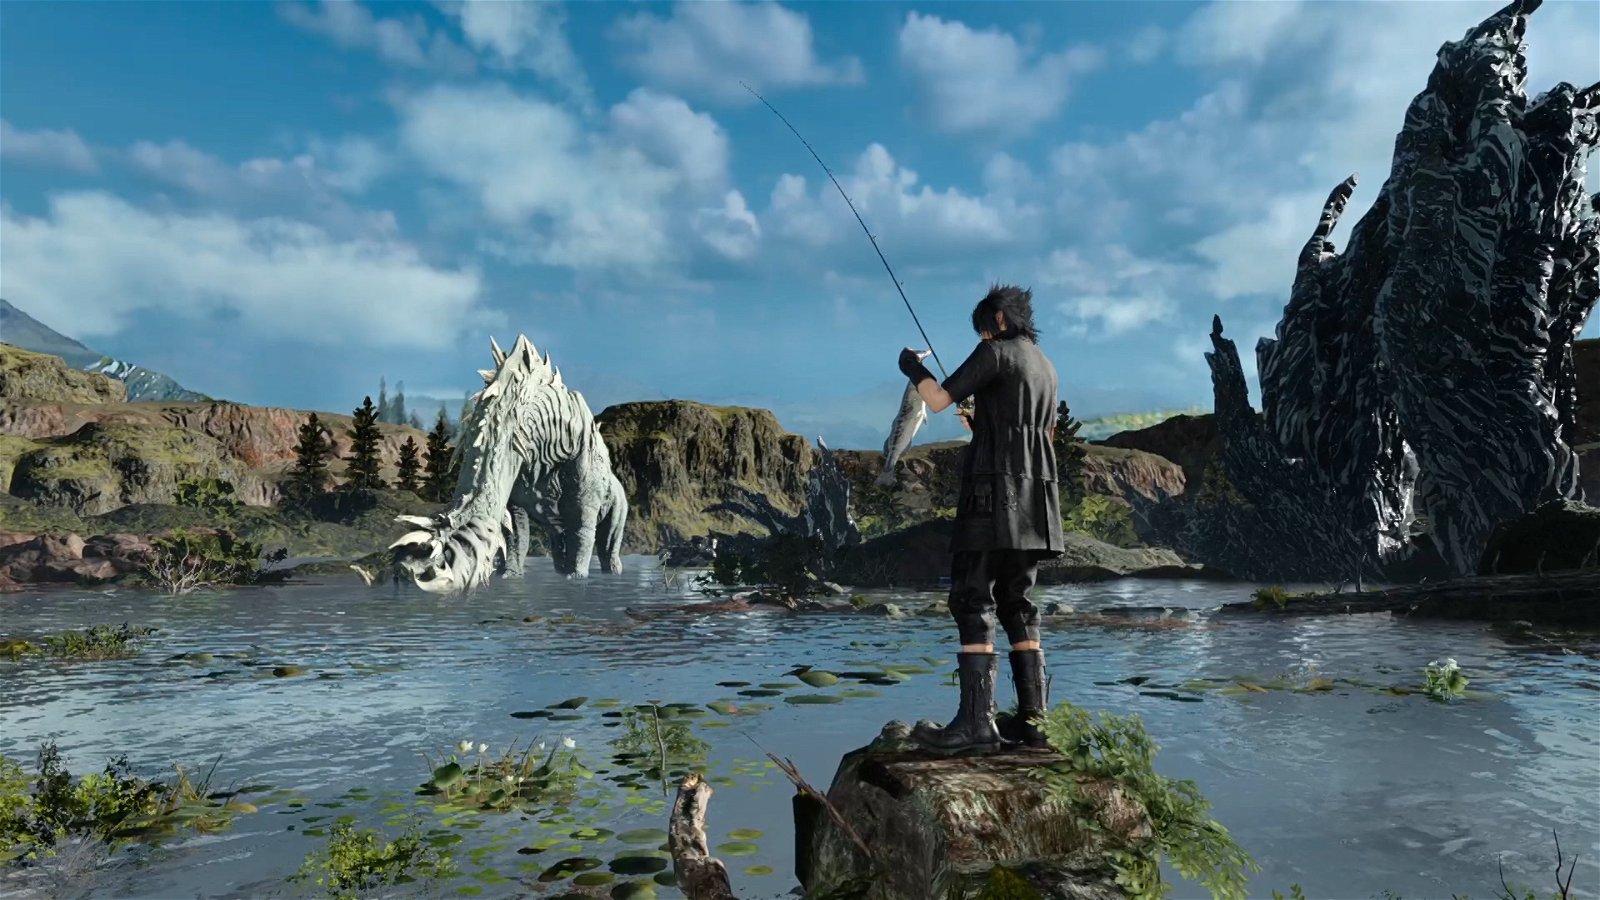 Monster of the deep final fantasy xv psvr review not for Final fantasy 15 fishing guide